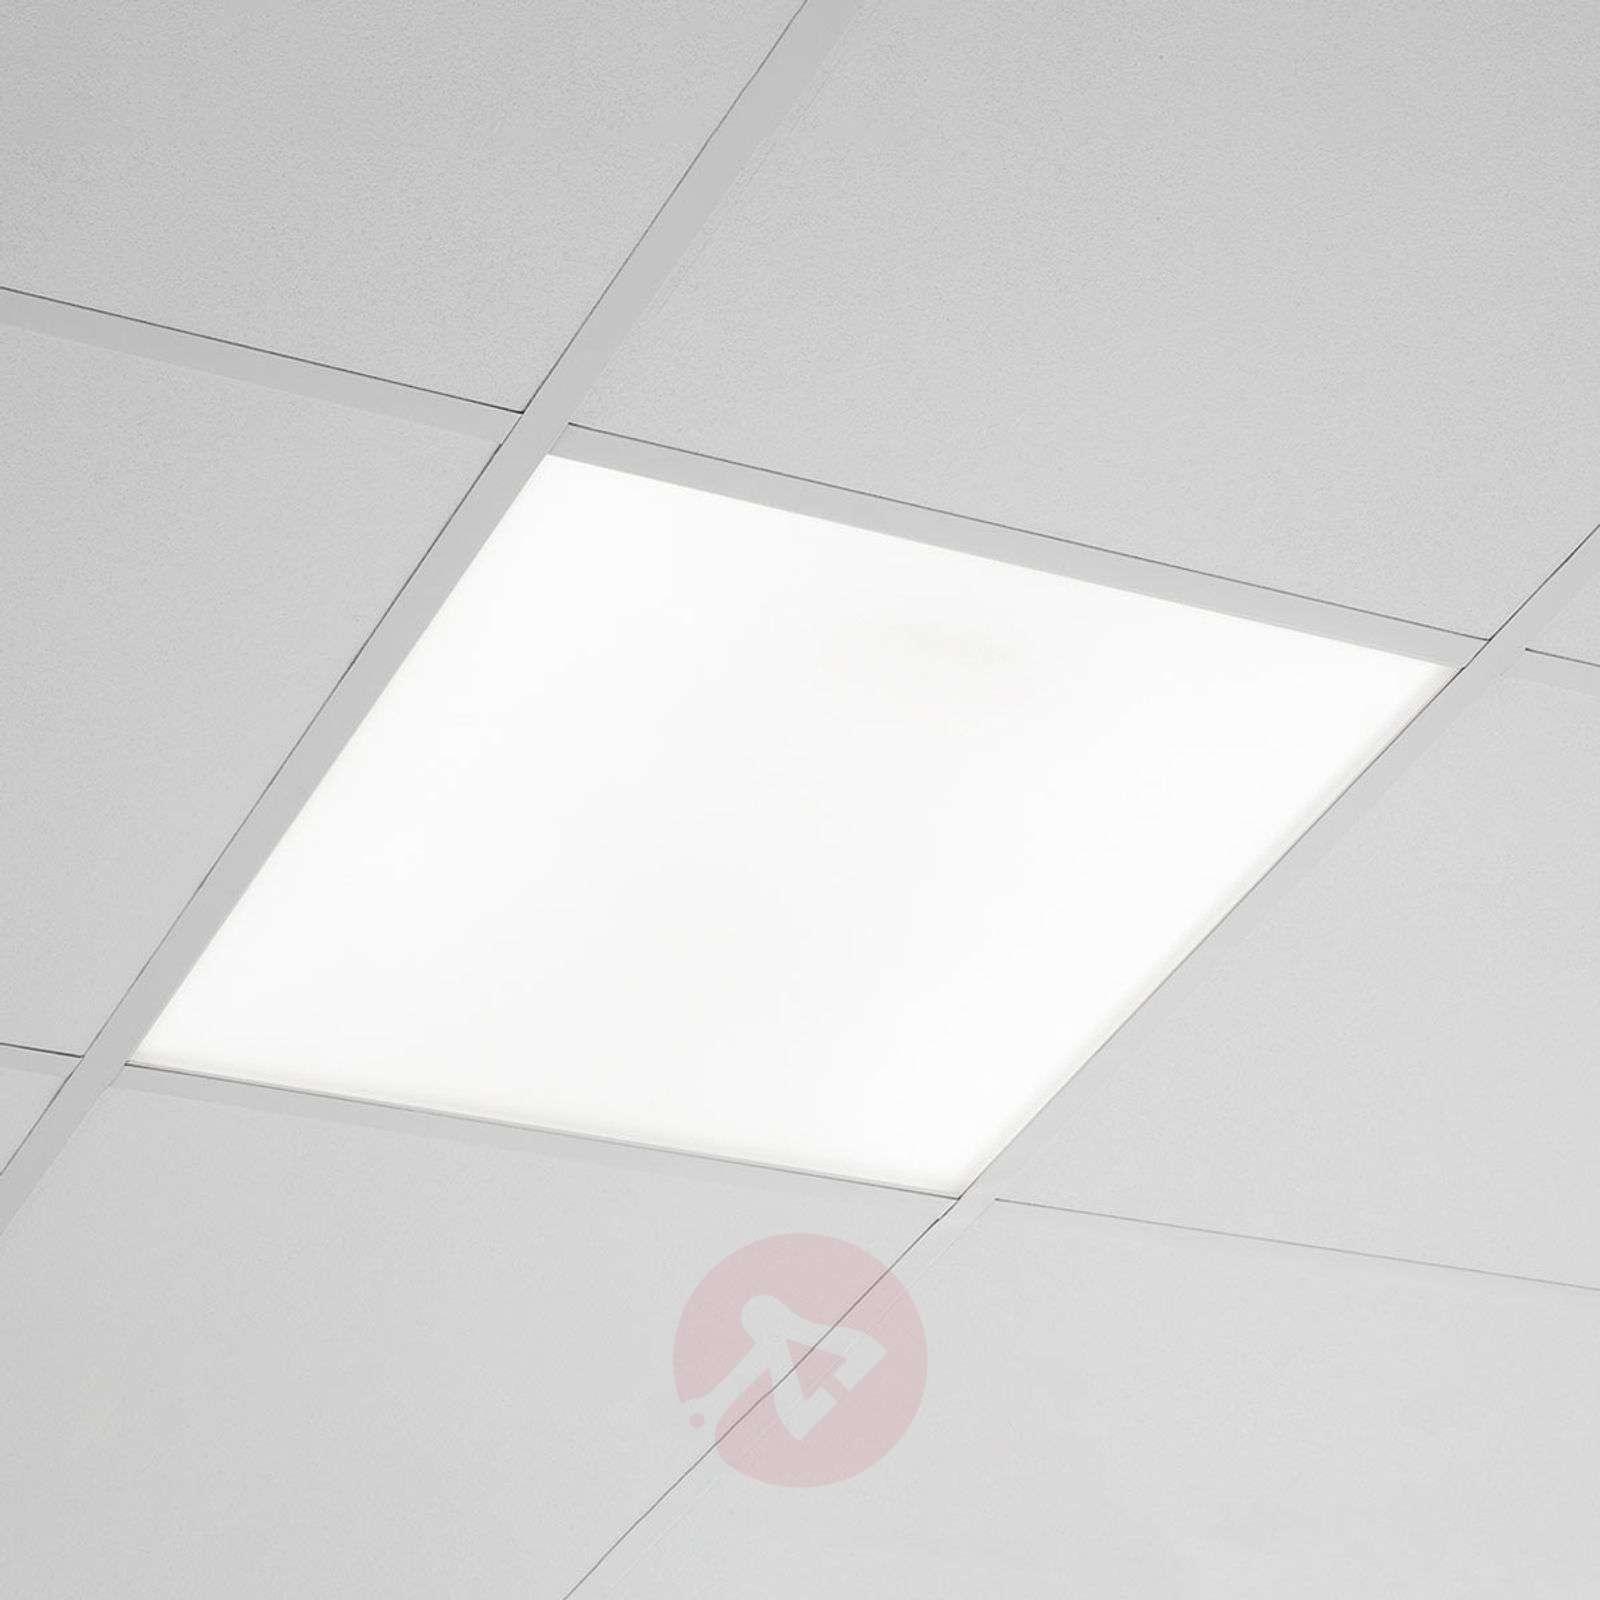 LED louvre light C95-R 62.5 x 62.5 cm HF 4,000 K_6040227_1